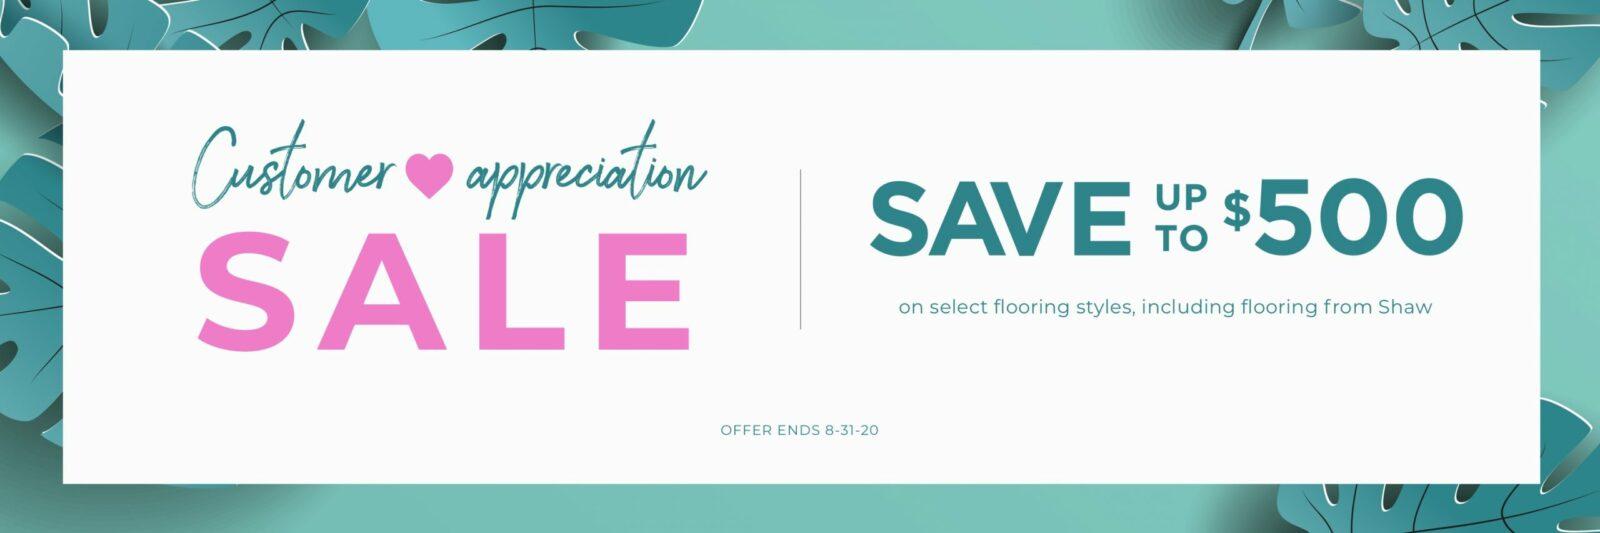 Customer Appreciation Sale | Shelley Carpets